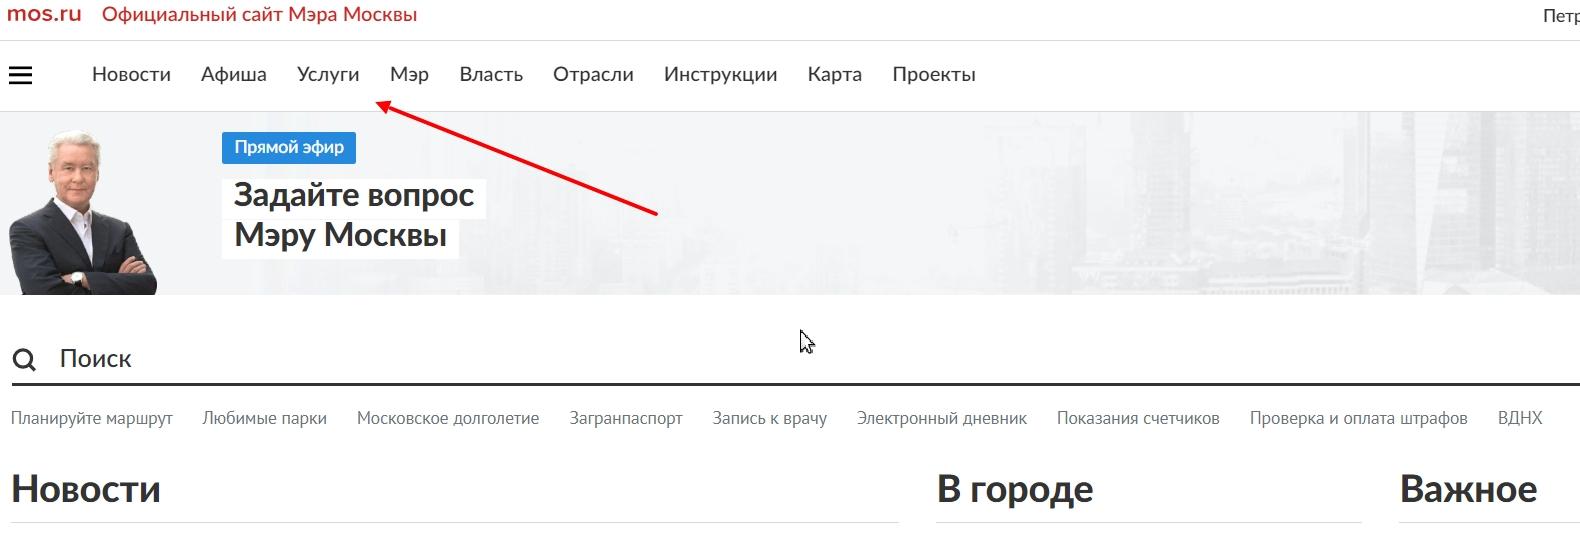 "Найти и перейти в каталог ""Услуги"""